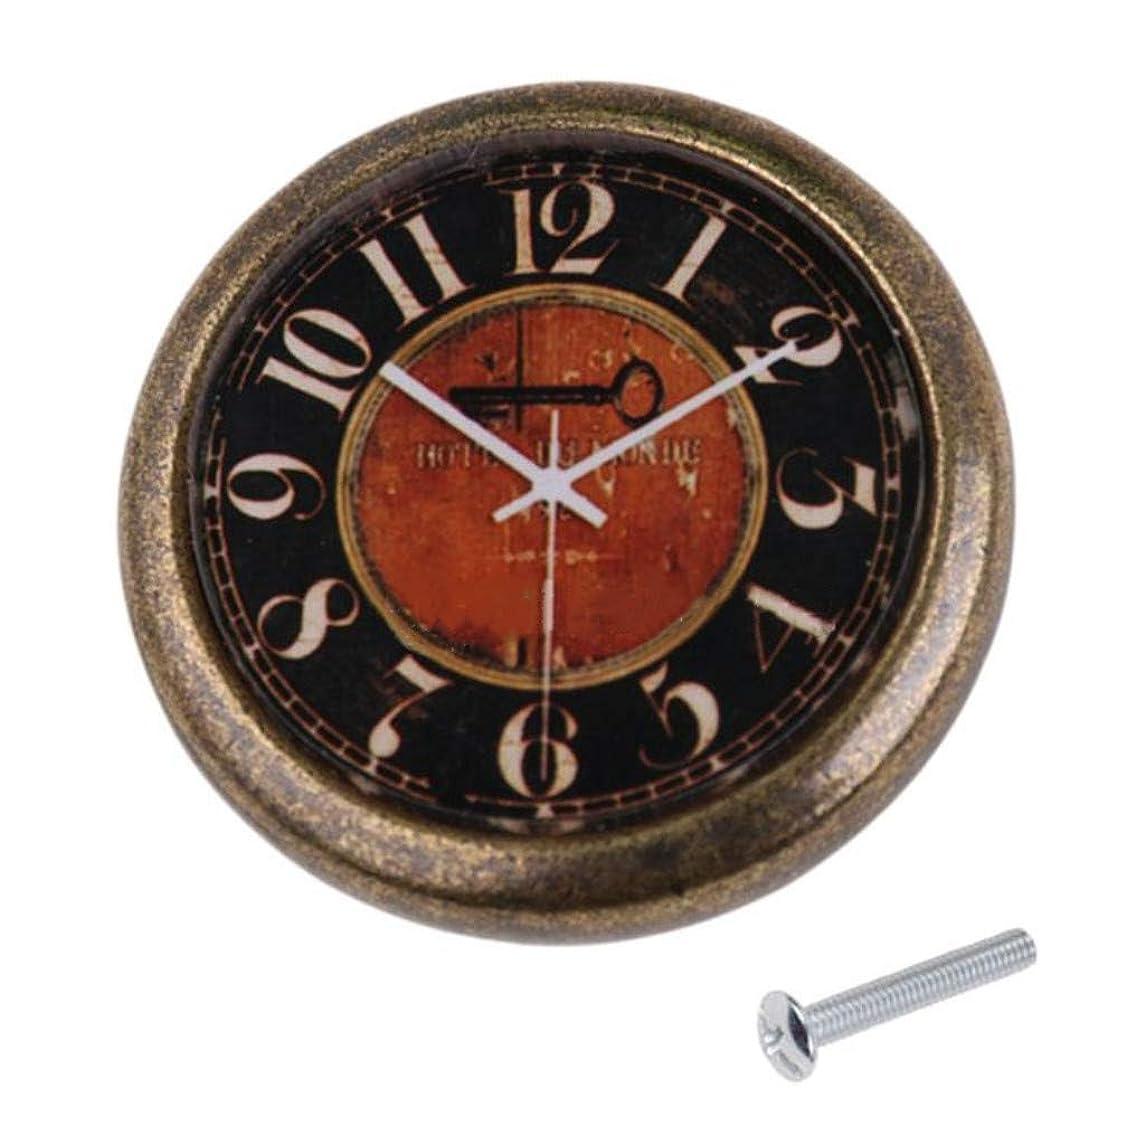 Vintage Clock Drawer Handle Cabinet Door Pull Knob Hardware Wardrobe Handle (Black)